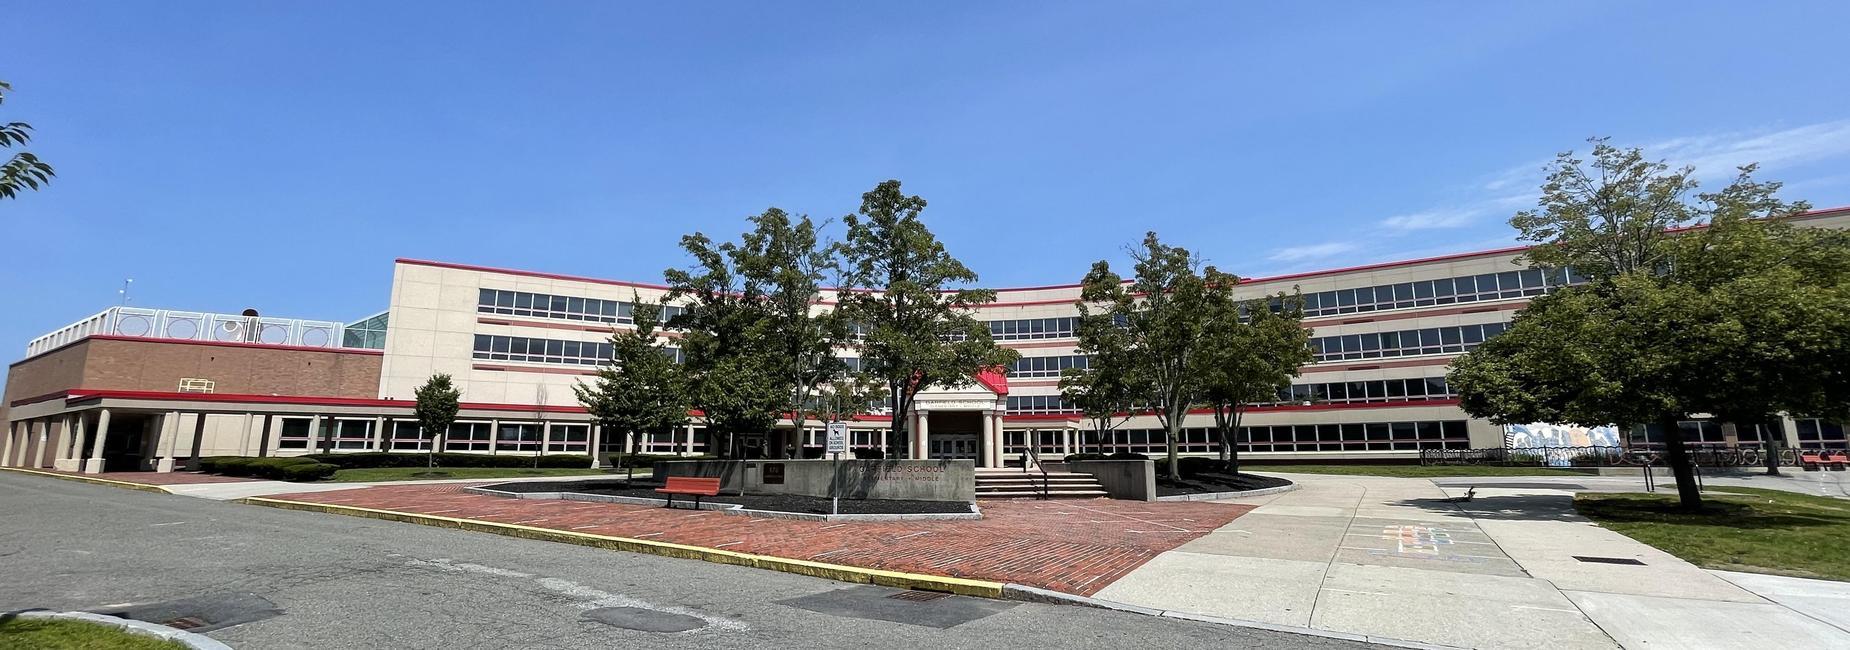 The Garfield Elementary School Building